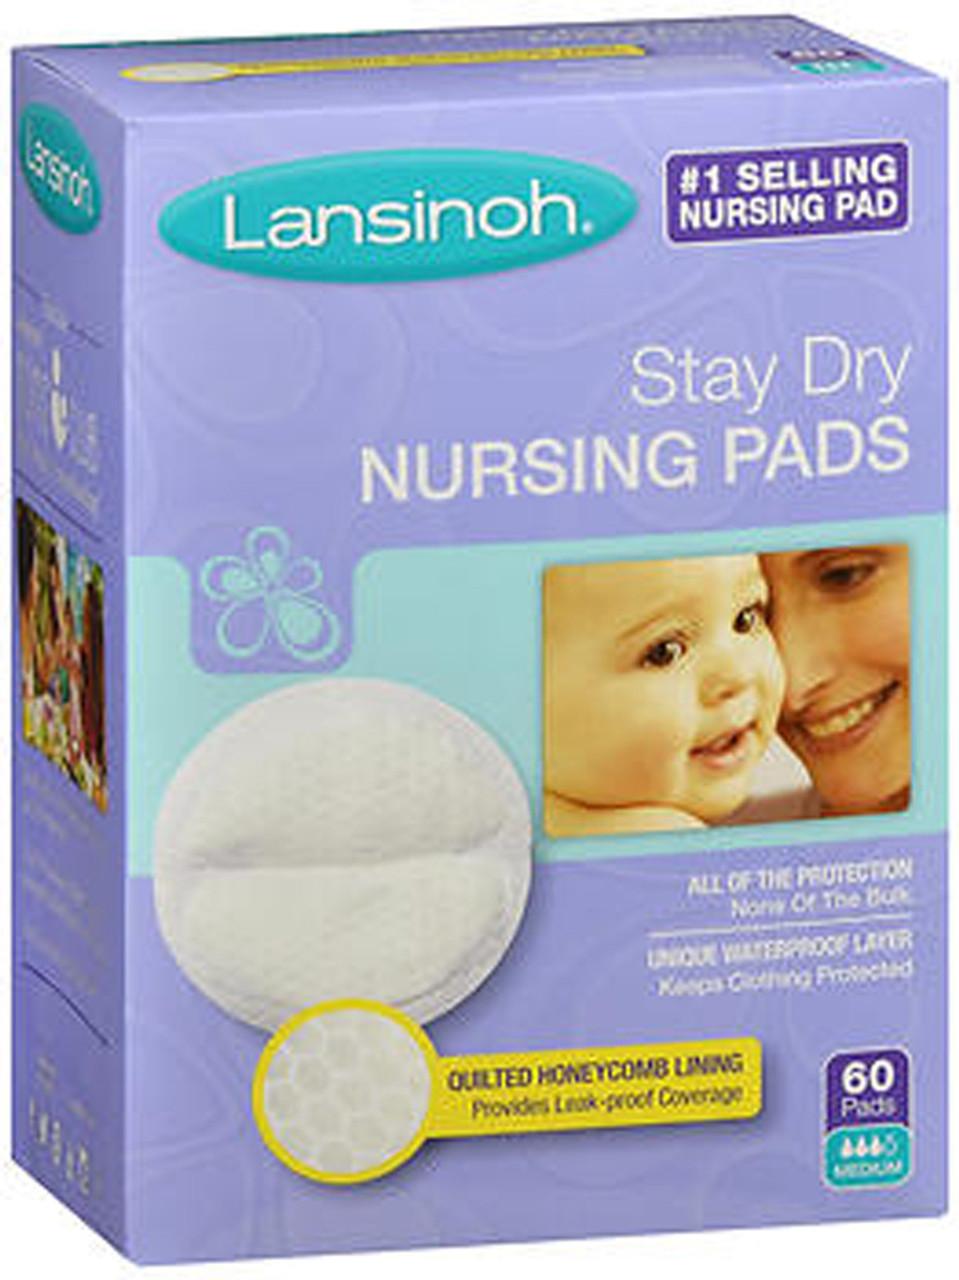 Lansinoh Disposable Nursing Pads 60 Ct The Online Drugstore C